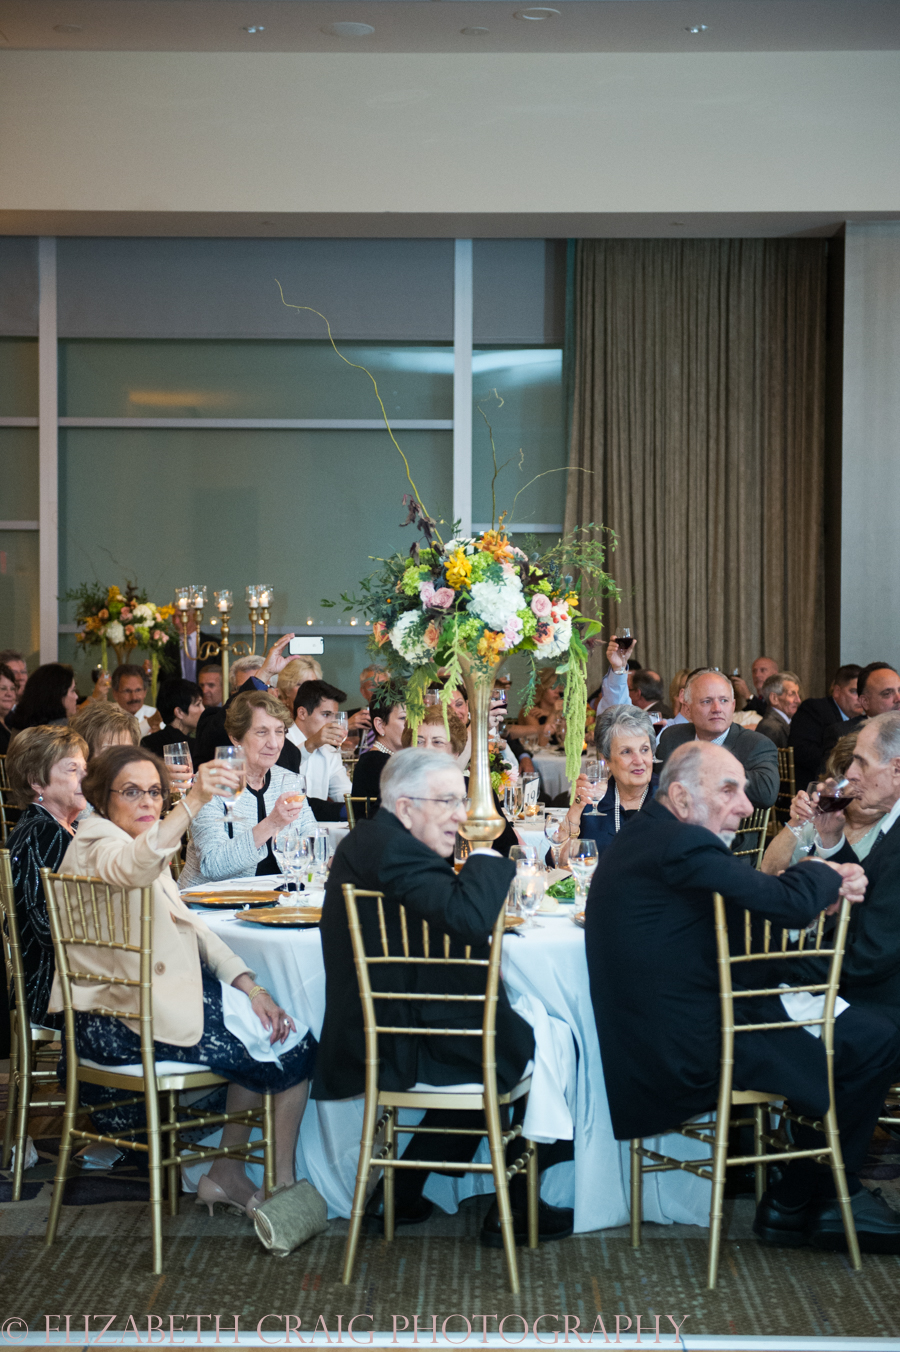 pittsburgh-greek-weddings-fairmont-weddings-receptions-elizabeth-craig-photohgraphy-028